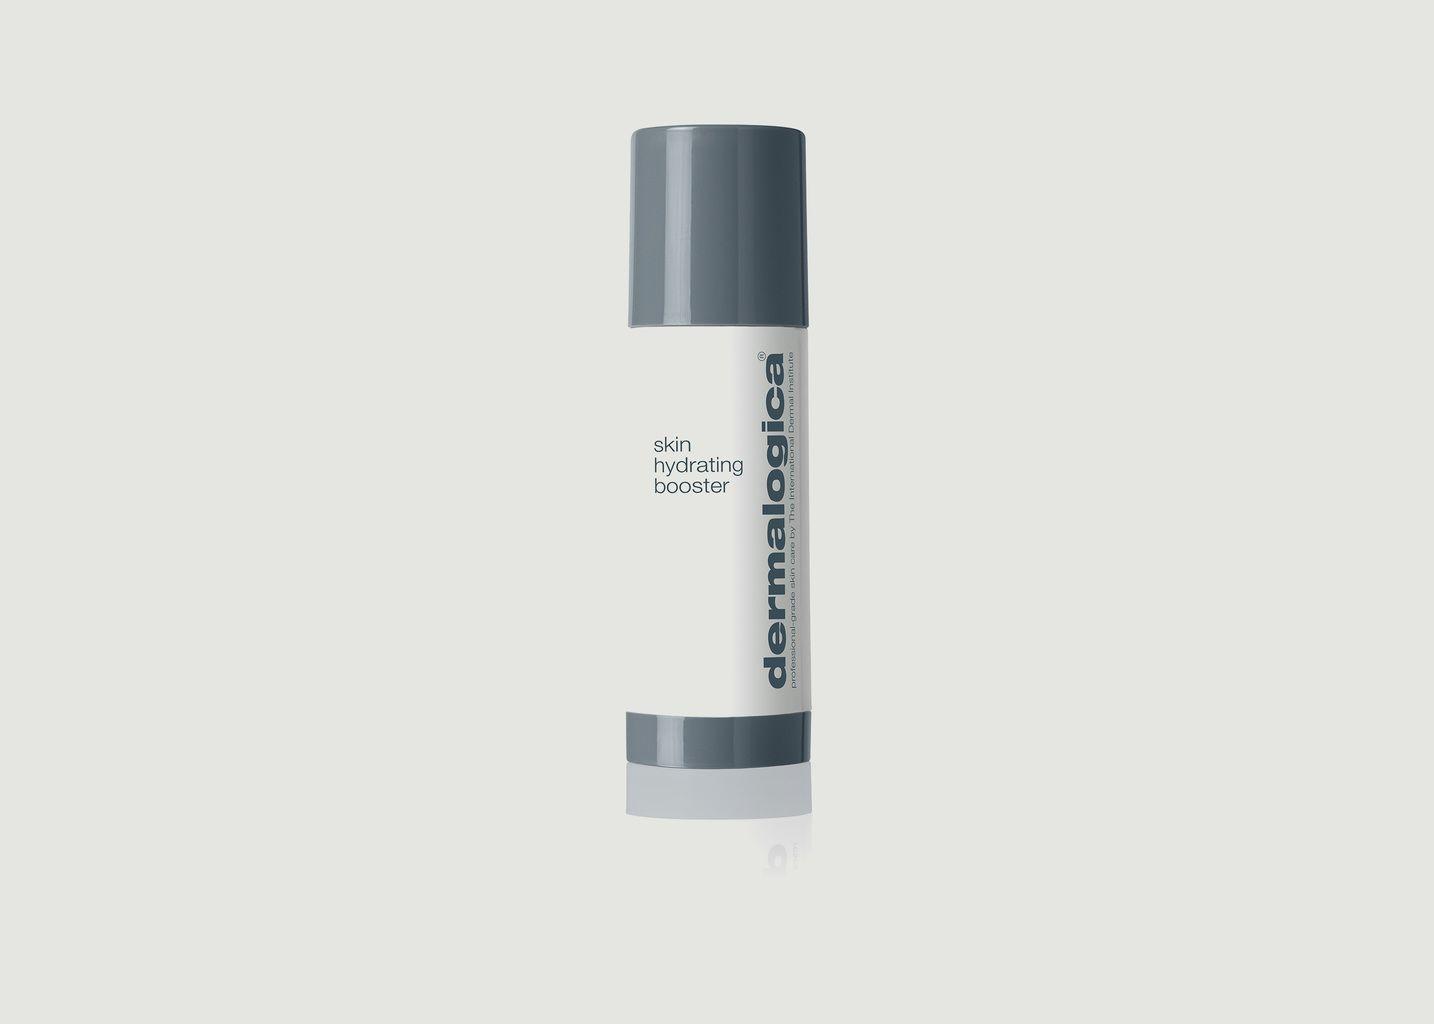 Skin hydrating booster 30ml - Dermalogica